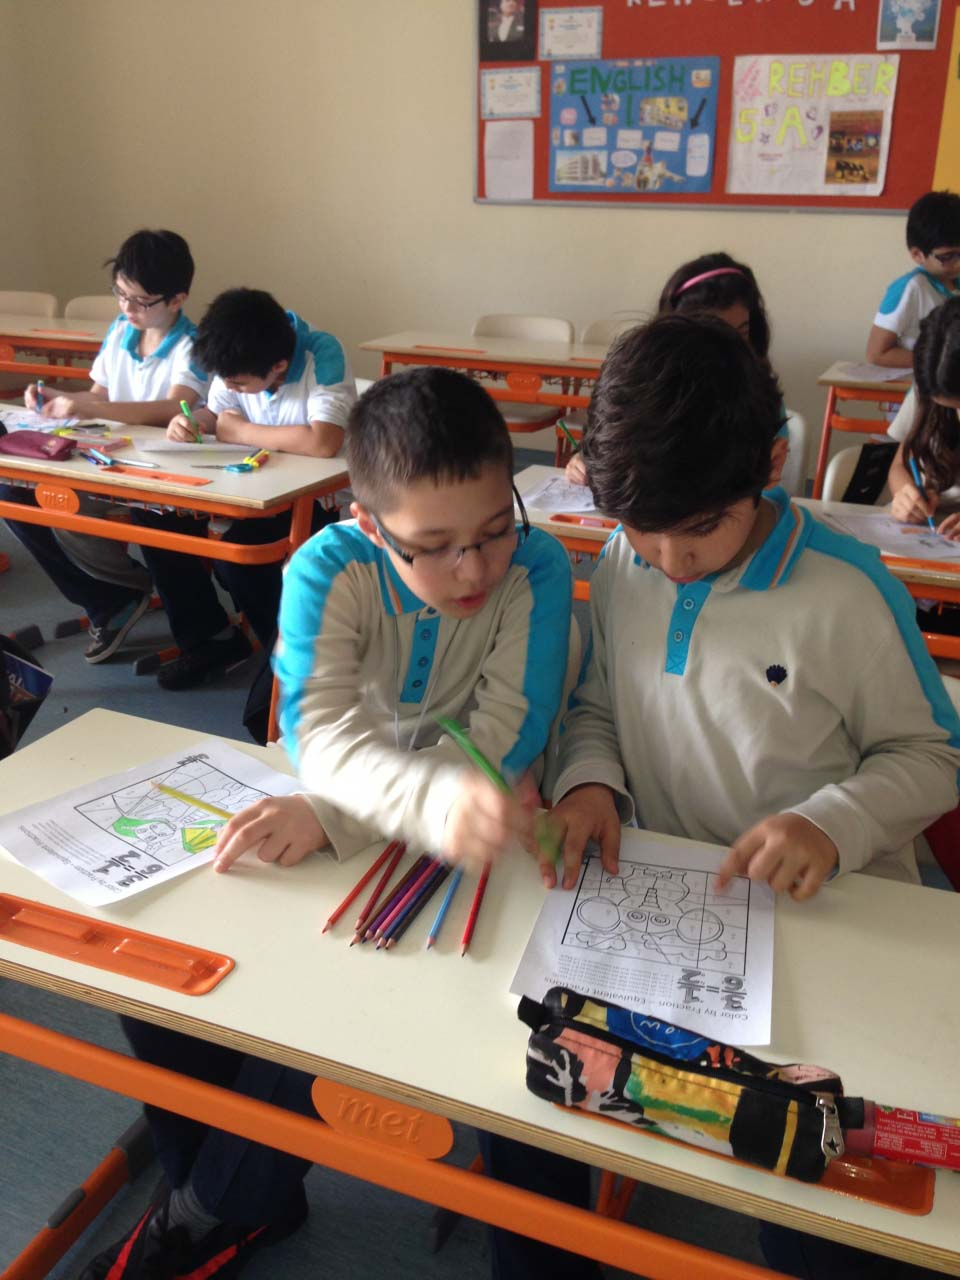 Okyanus Koleji Kolej özel Okul Ana Okulu Ilkokul Ortaokul